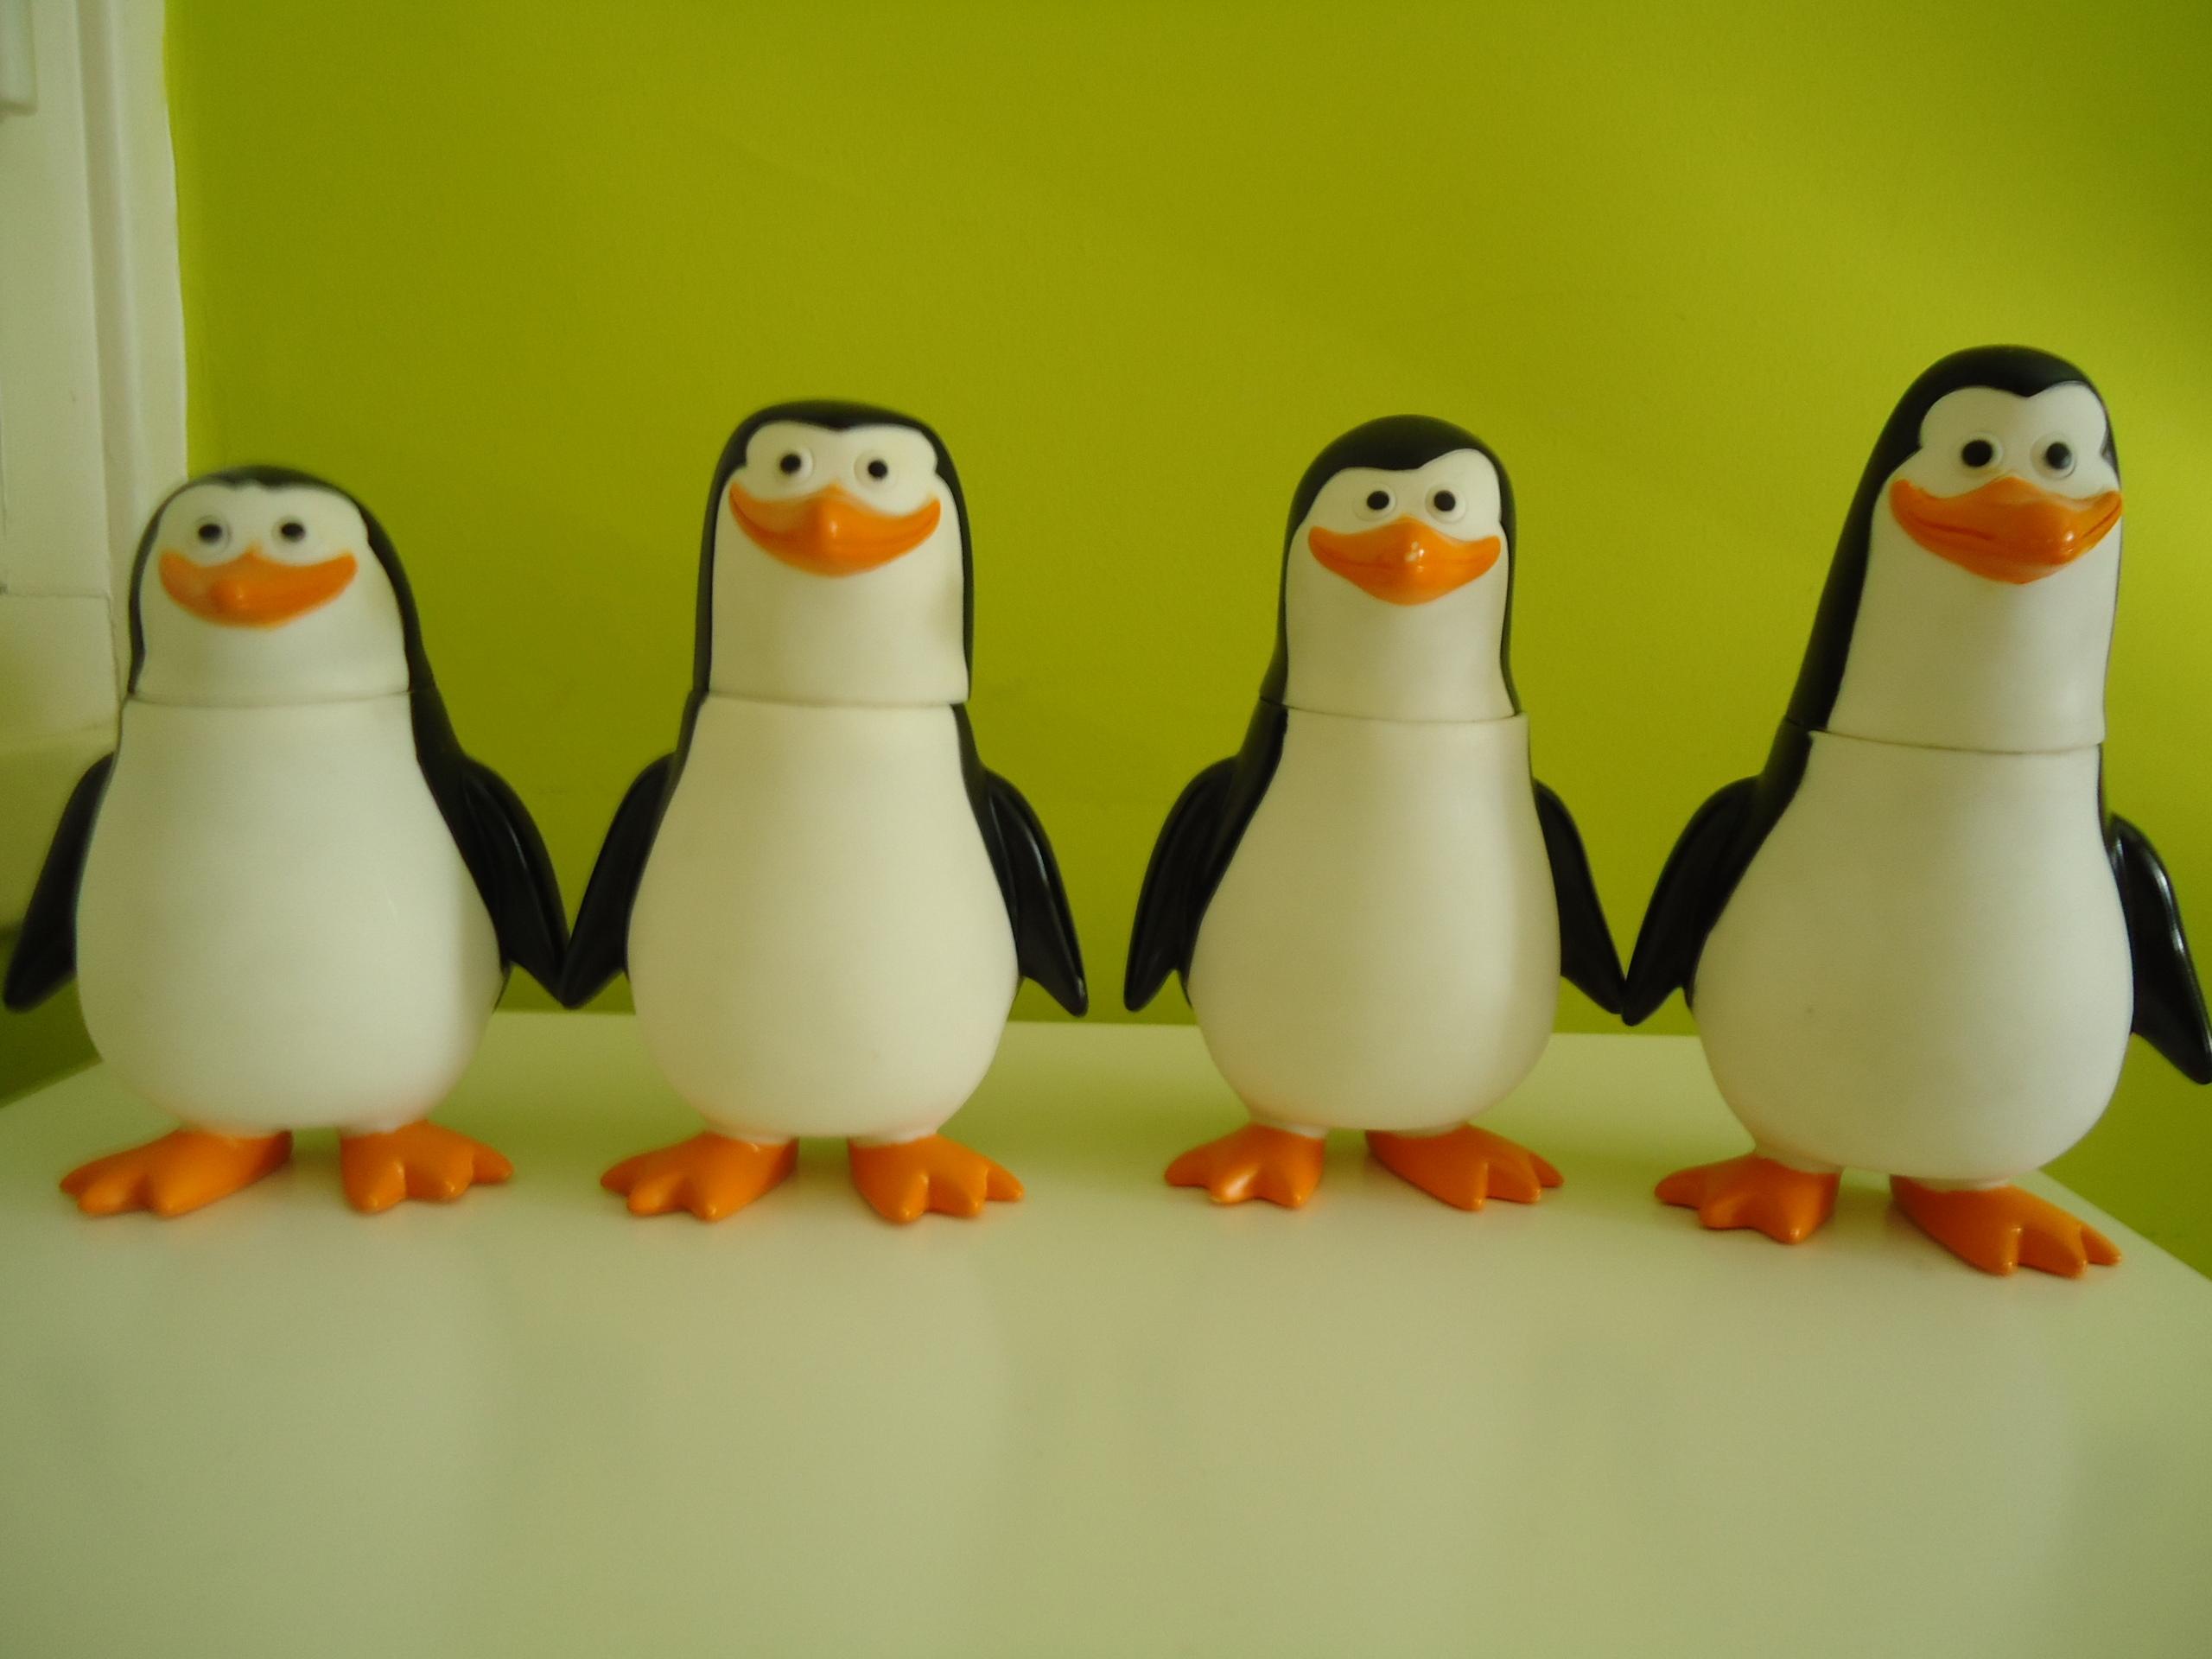 Penguins Of Madagascar Toys 15